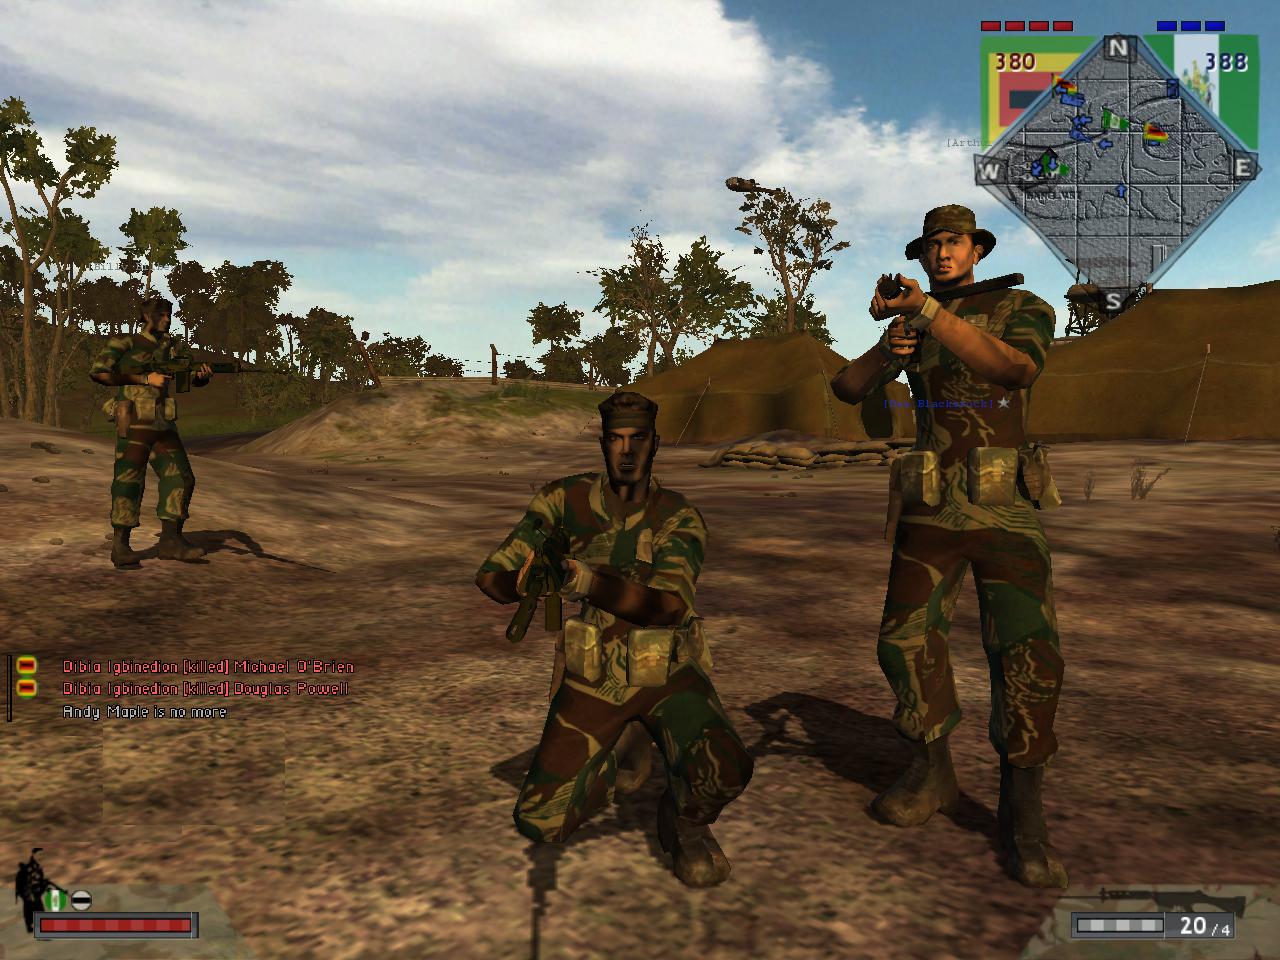 Rhodesian SAS Image Mod DB